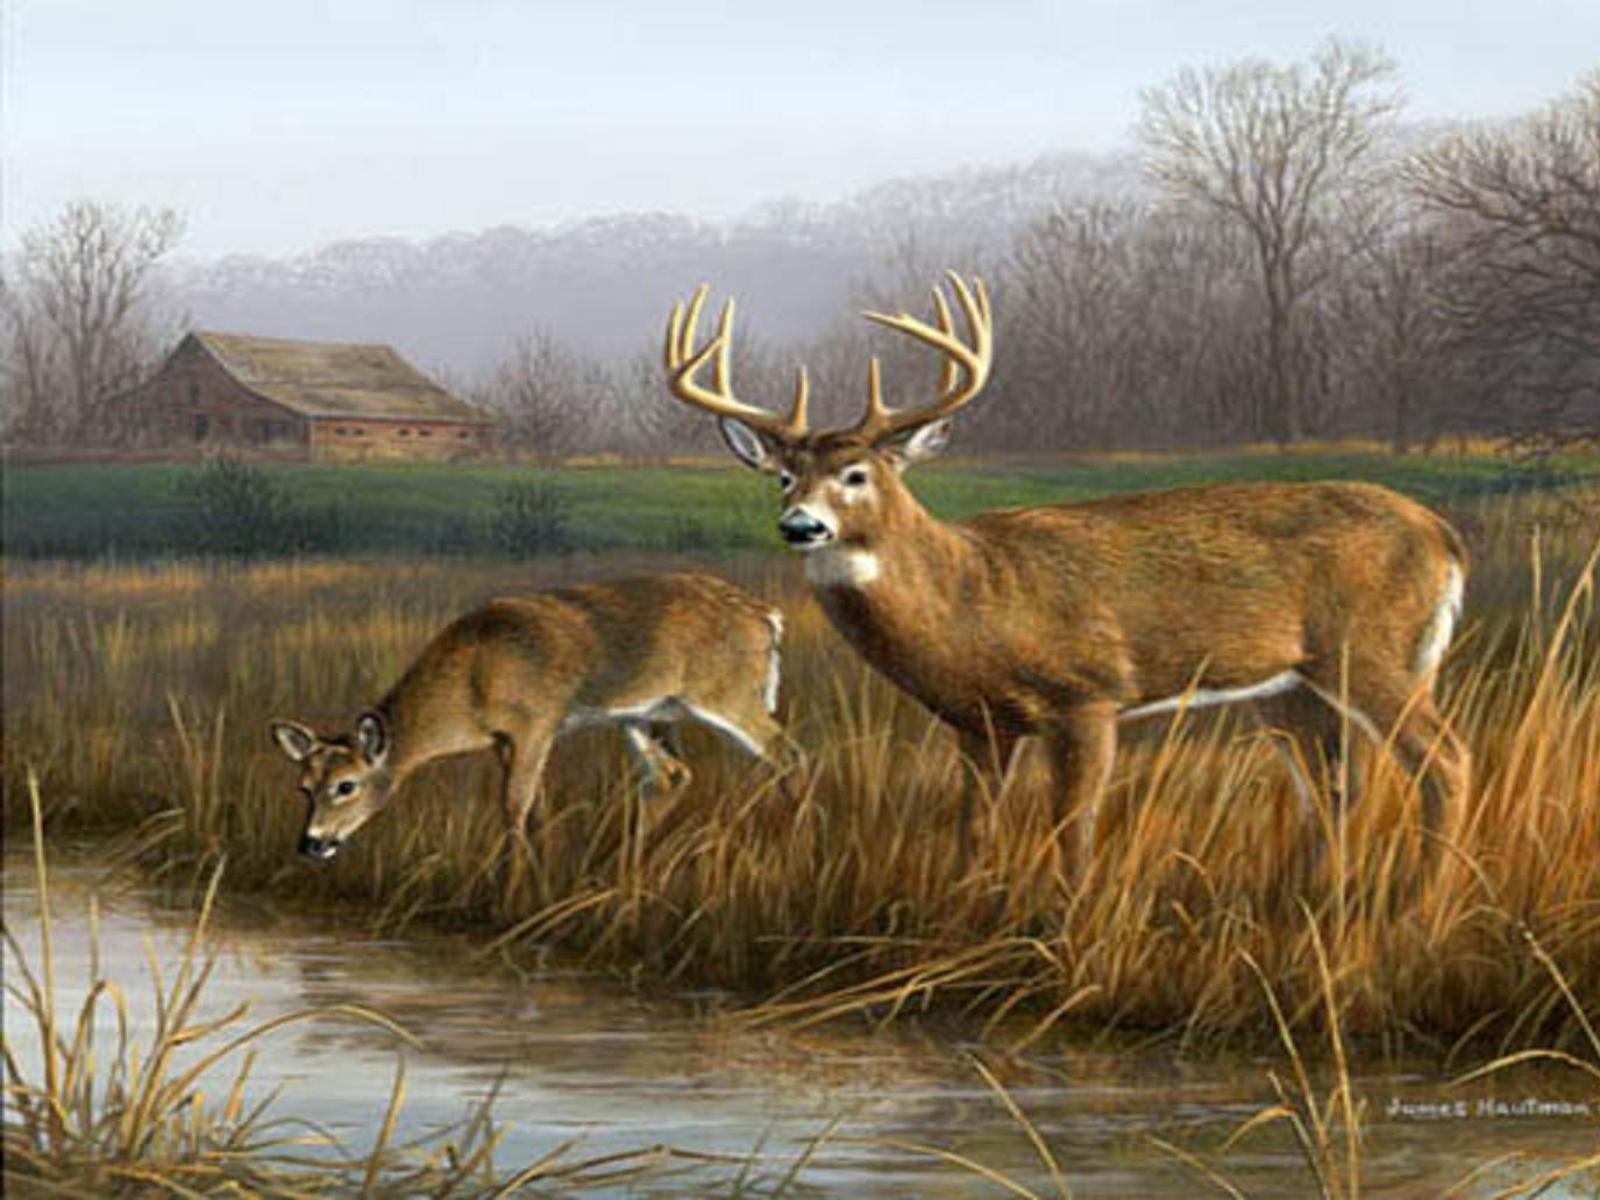 deer hd wallpapers deer hd wallpapers deer hd wallpapers deer hd 1600x1200